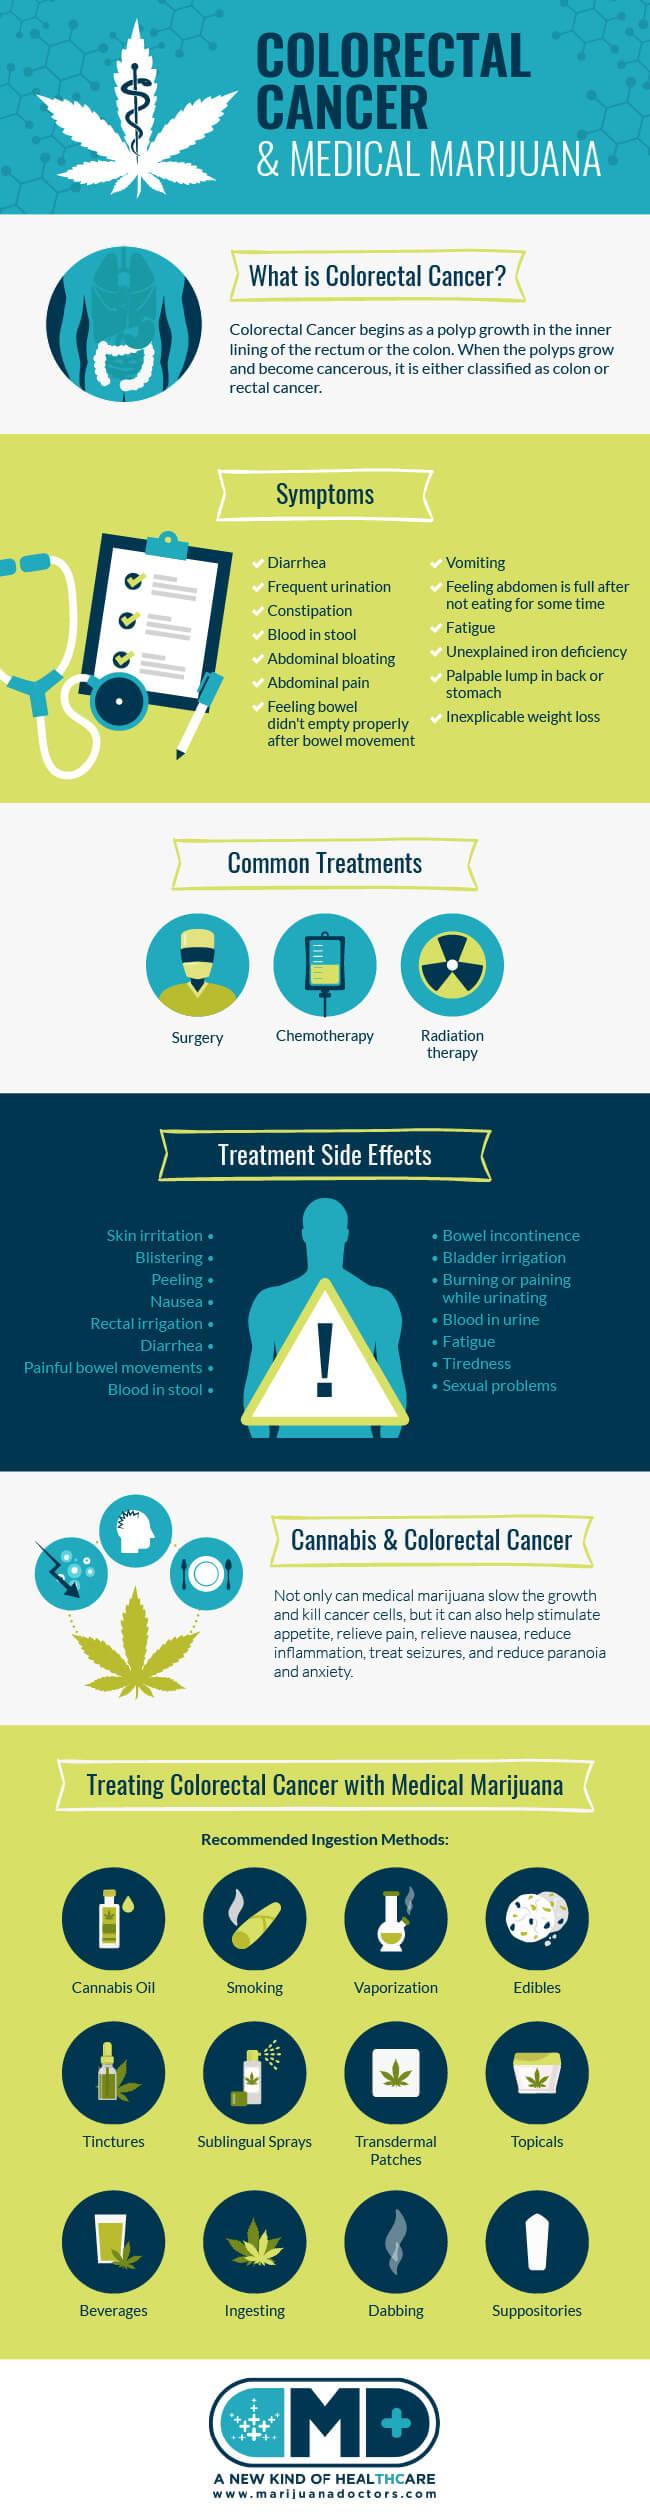 Medical Marijuana For Colorectal Cancer Marijuana Doctors